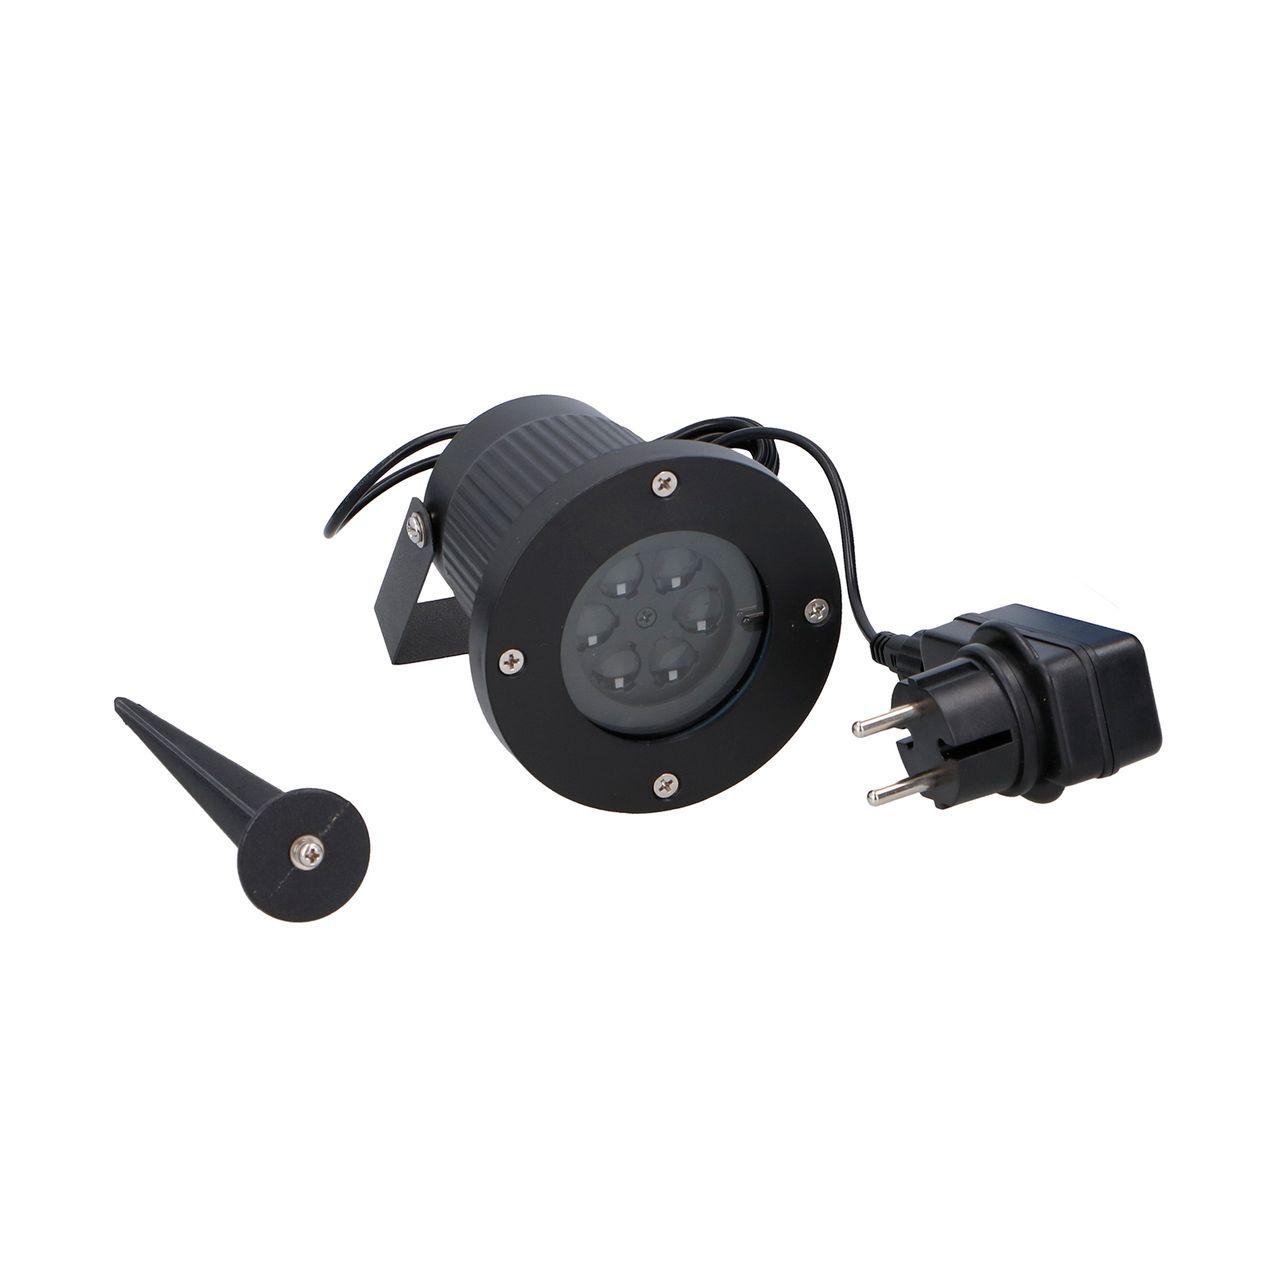 STAR-BRIGHT Wetterfester IP65 LED-Projektor Schneeflocken